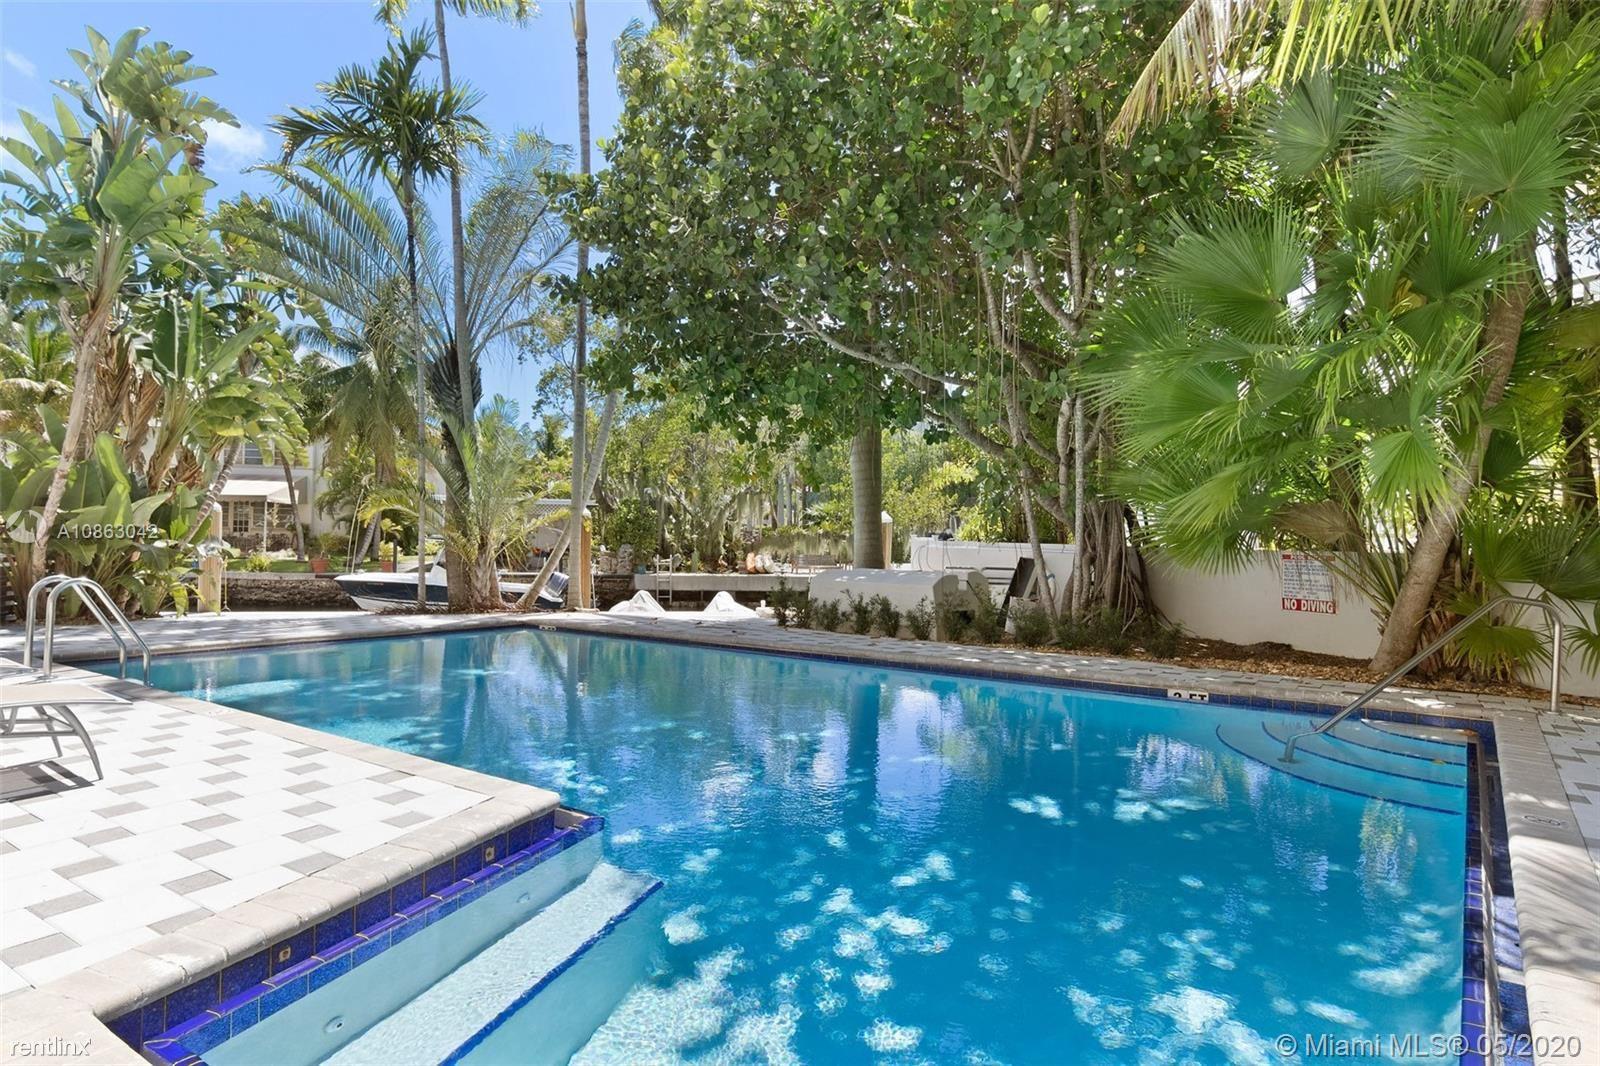 3564 W Fairview St # B3, Coconut Grove, FL - $8,000